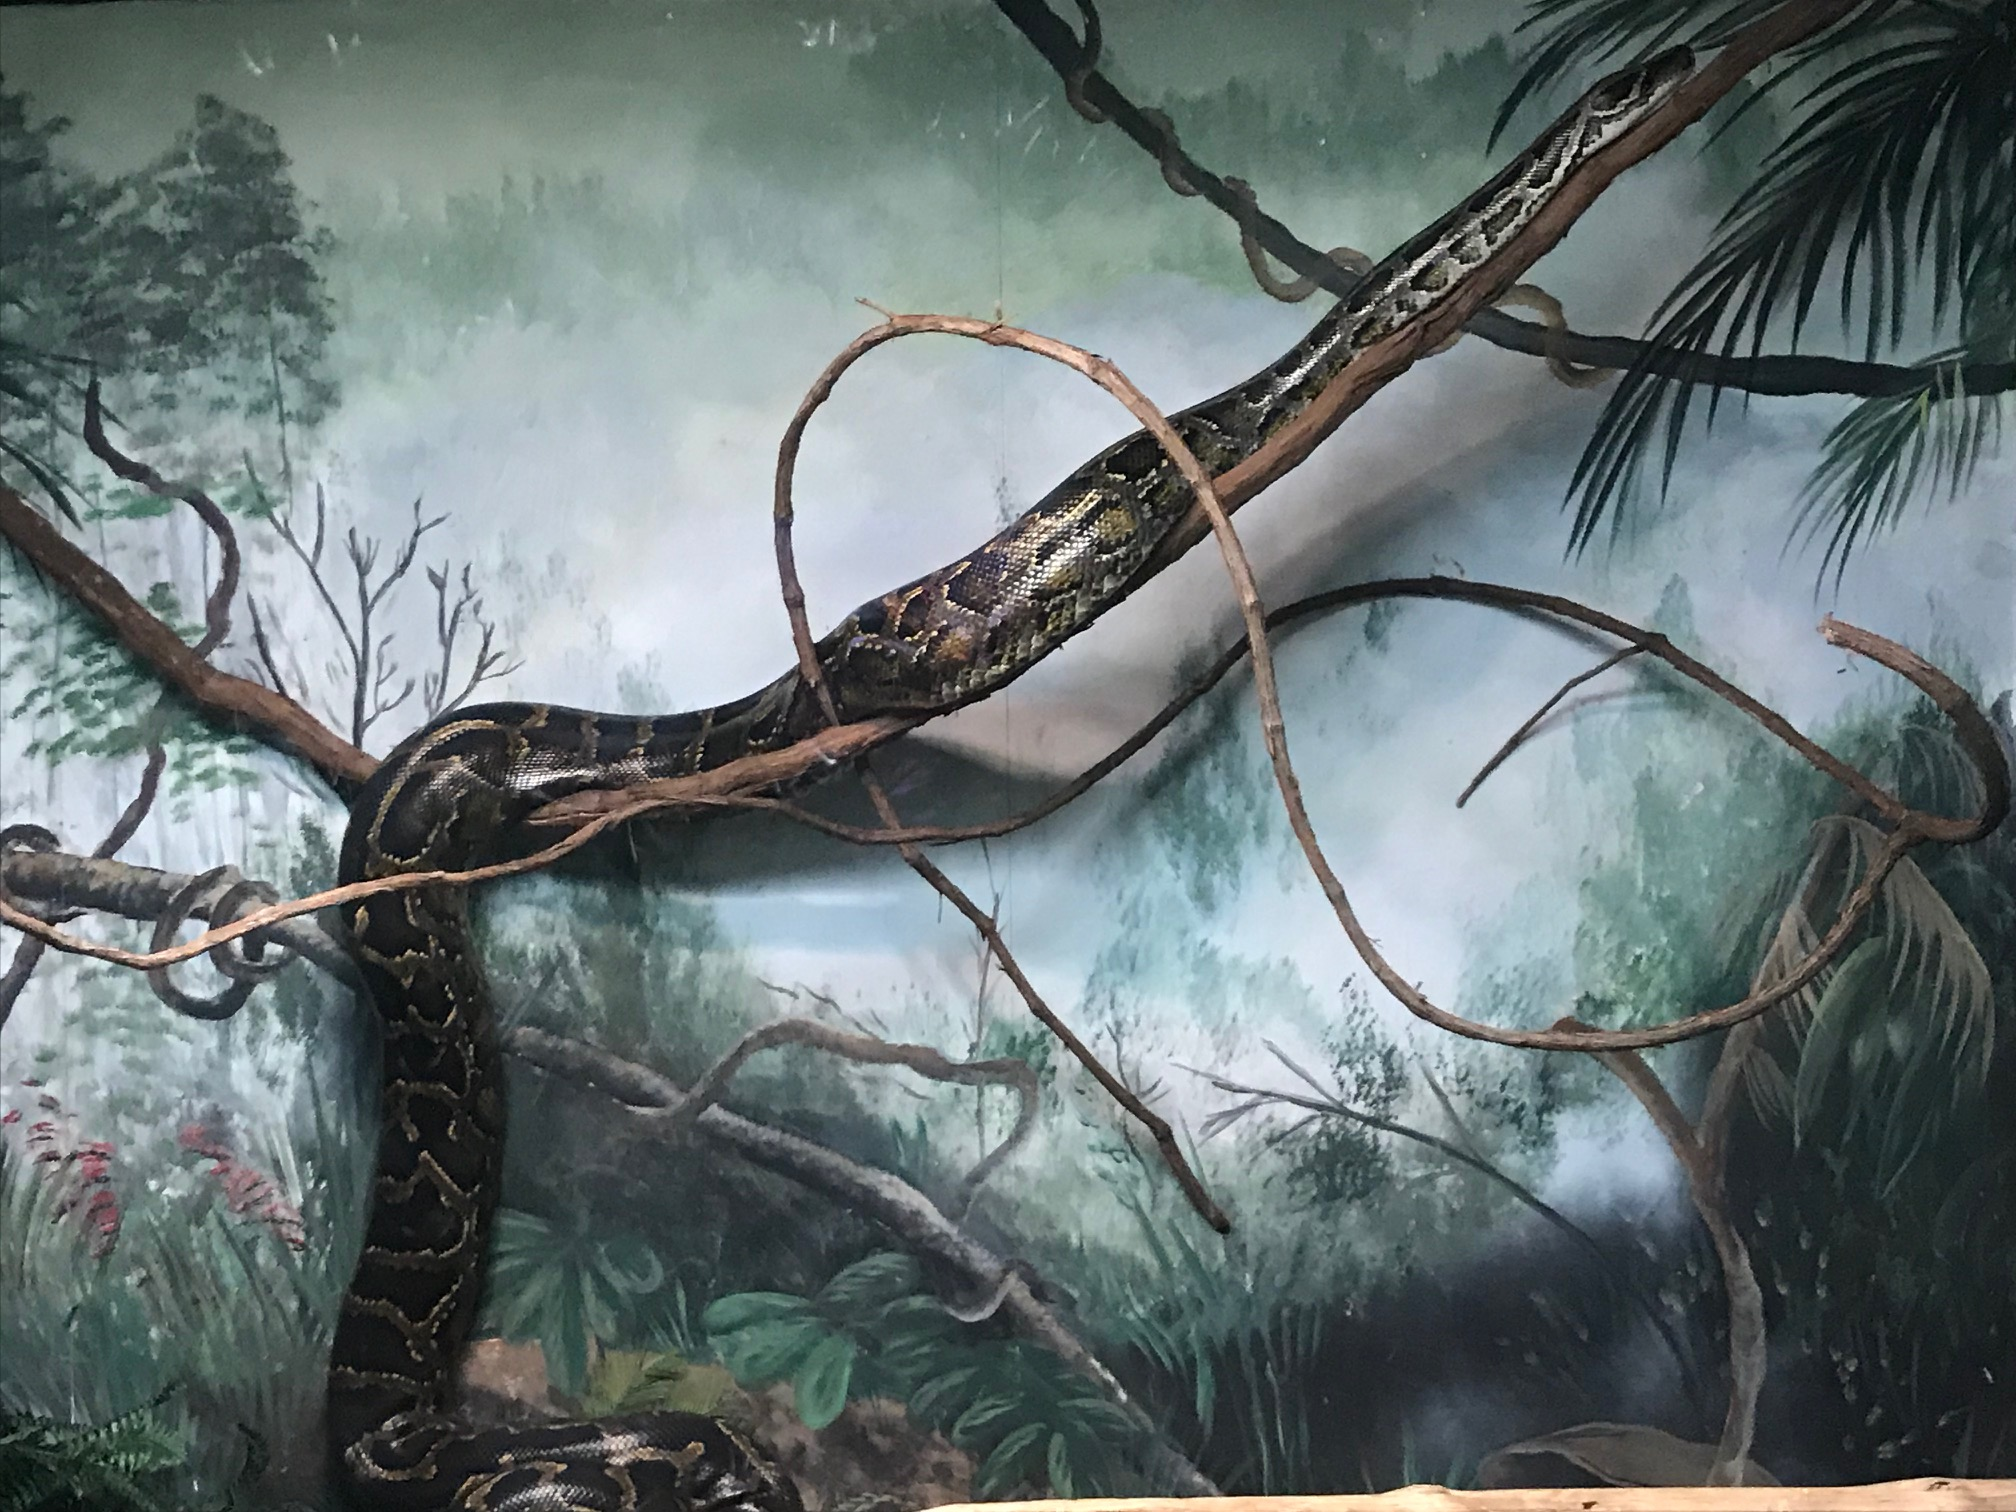 Burmese Python photo